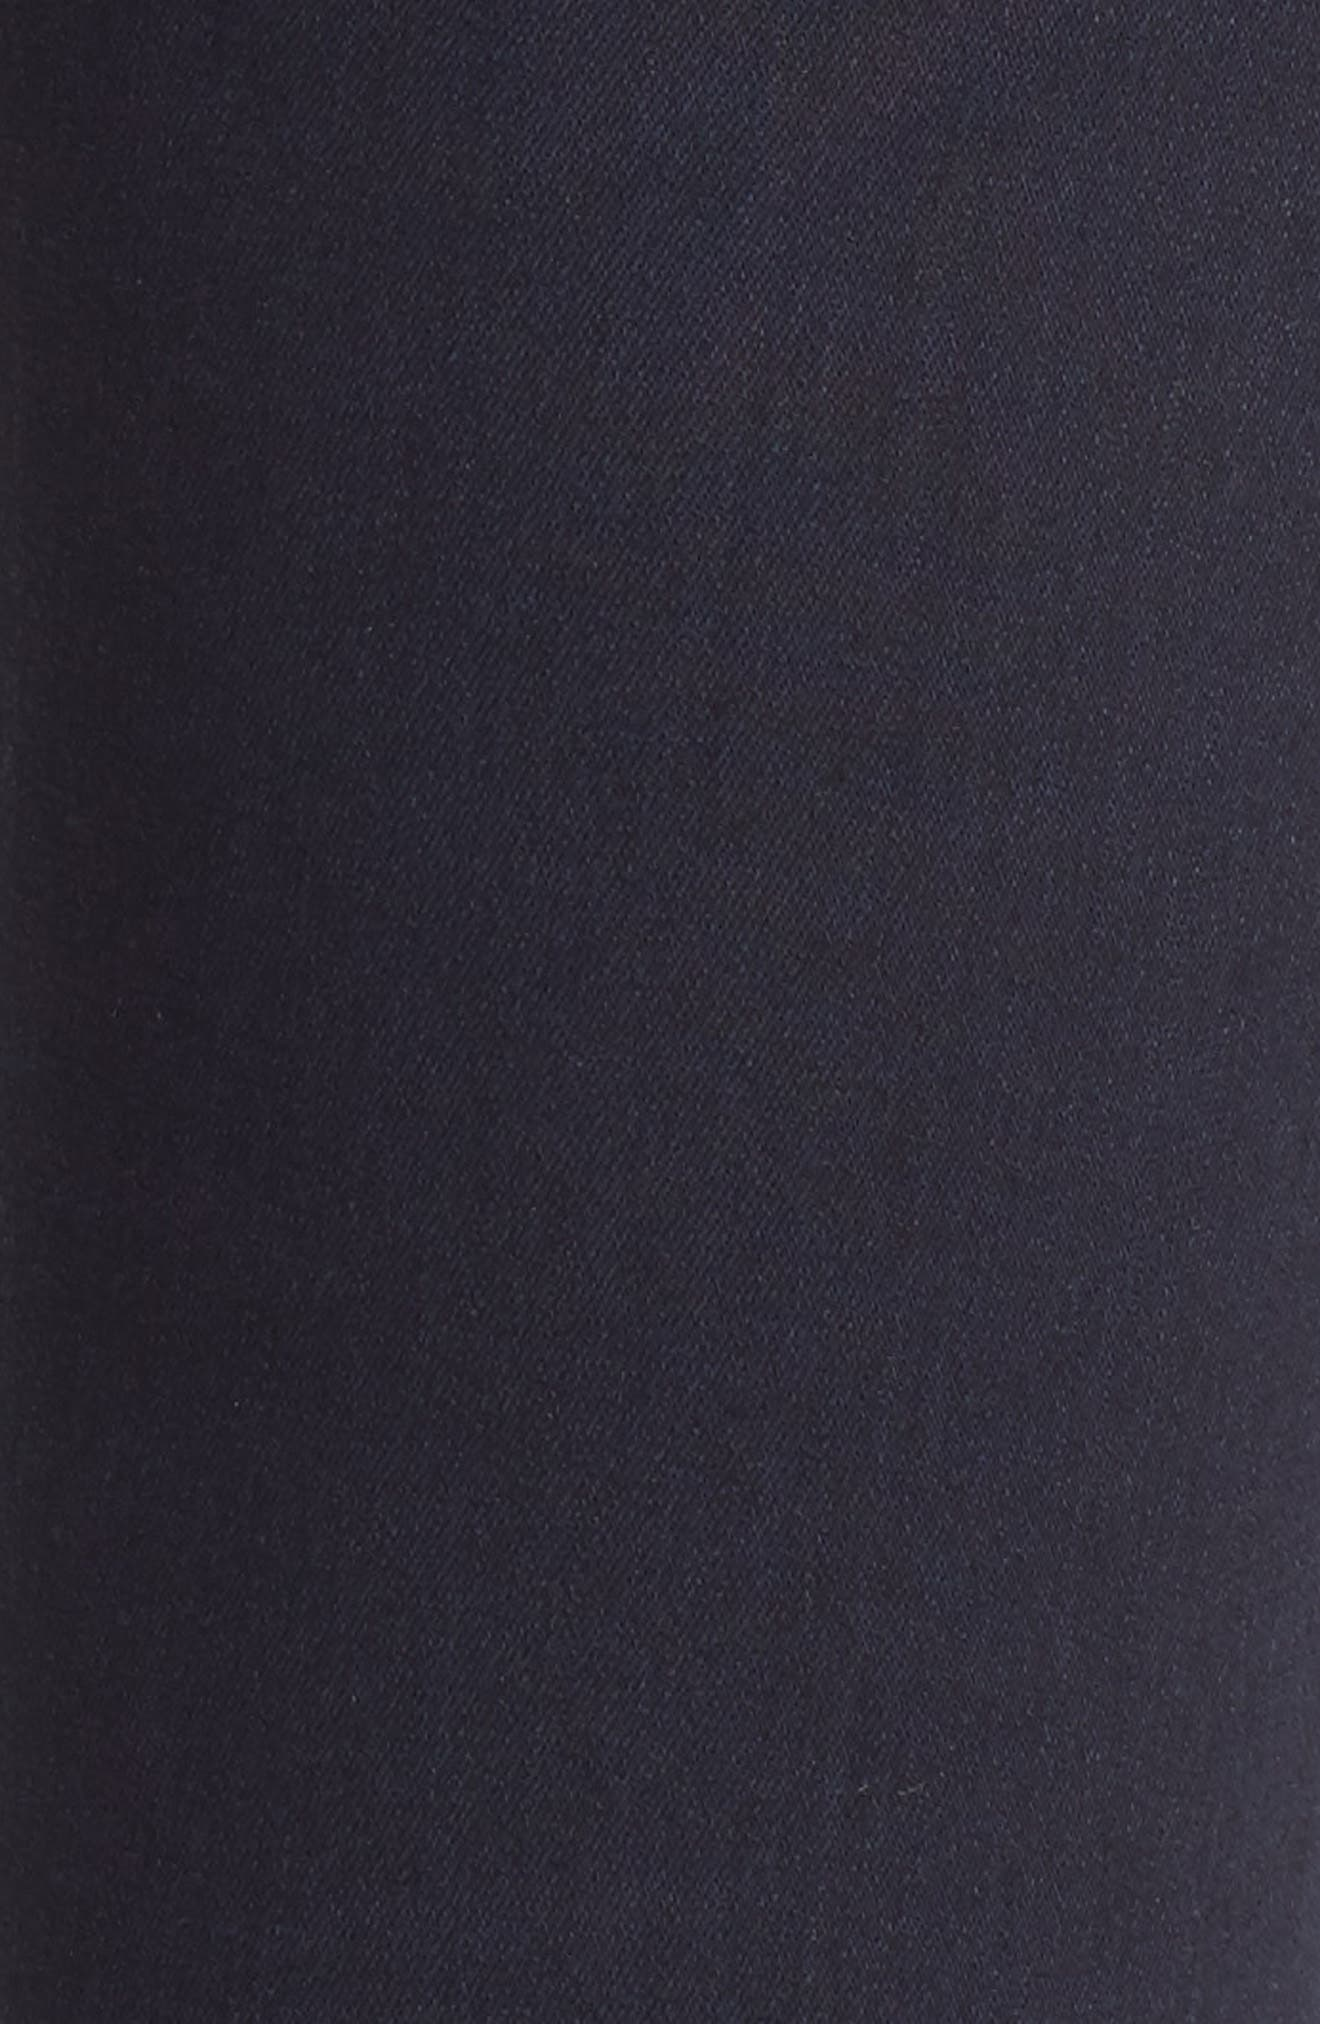 Rocket High Waist Skinny Jeans,                             Alternate thumbnail 6, color,                             409